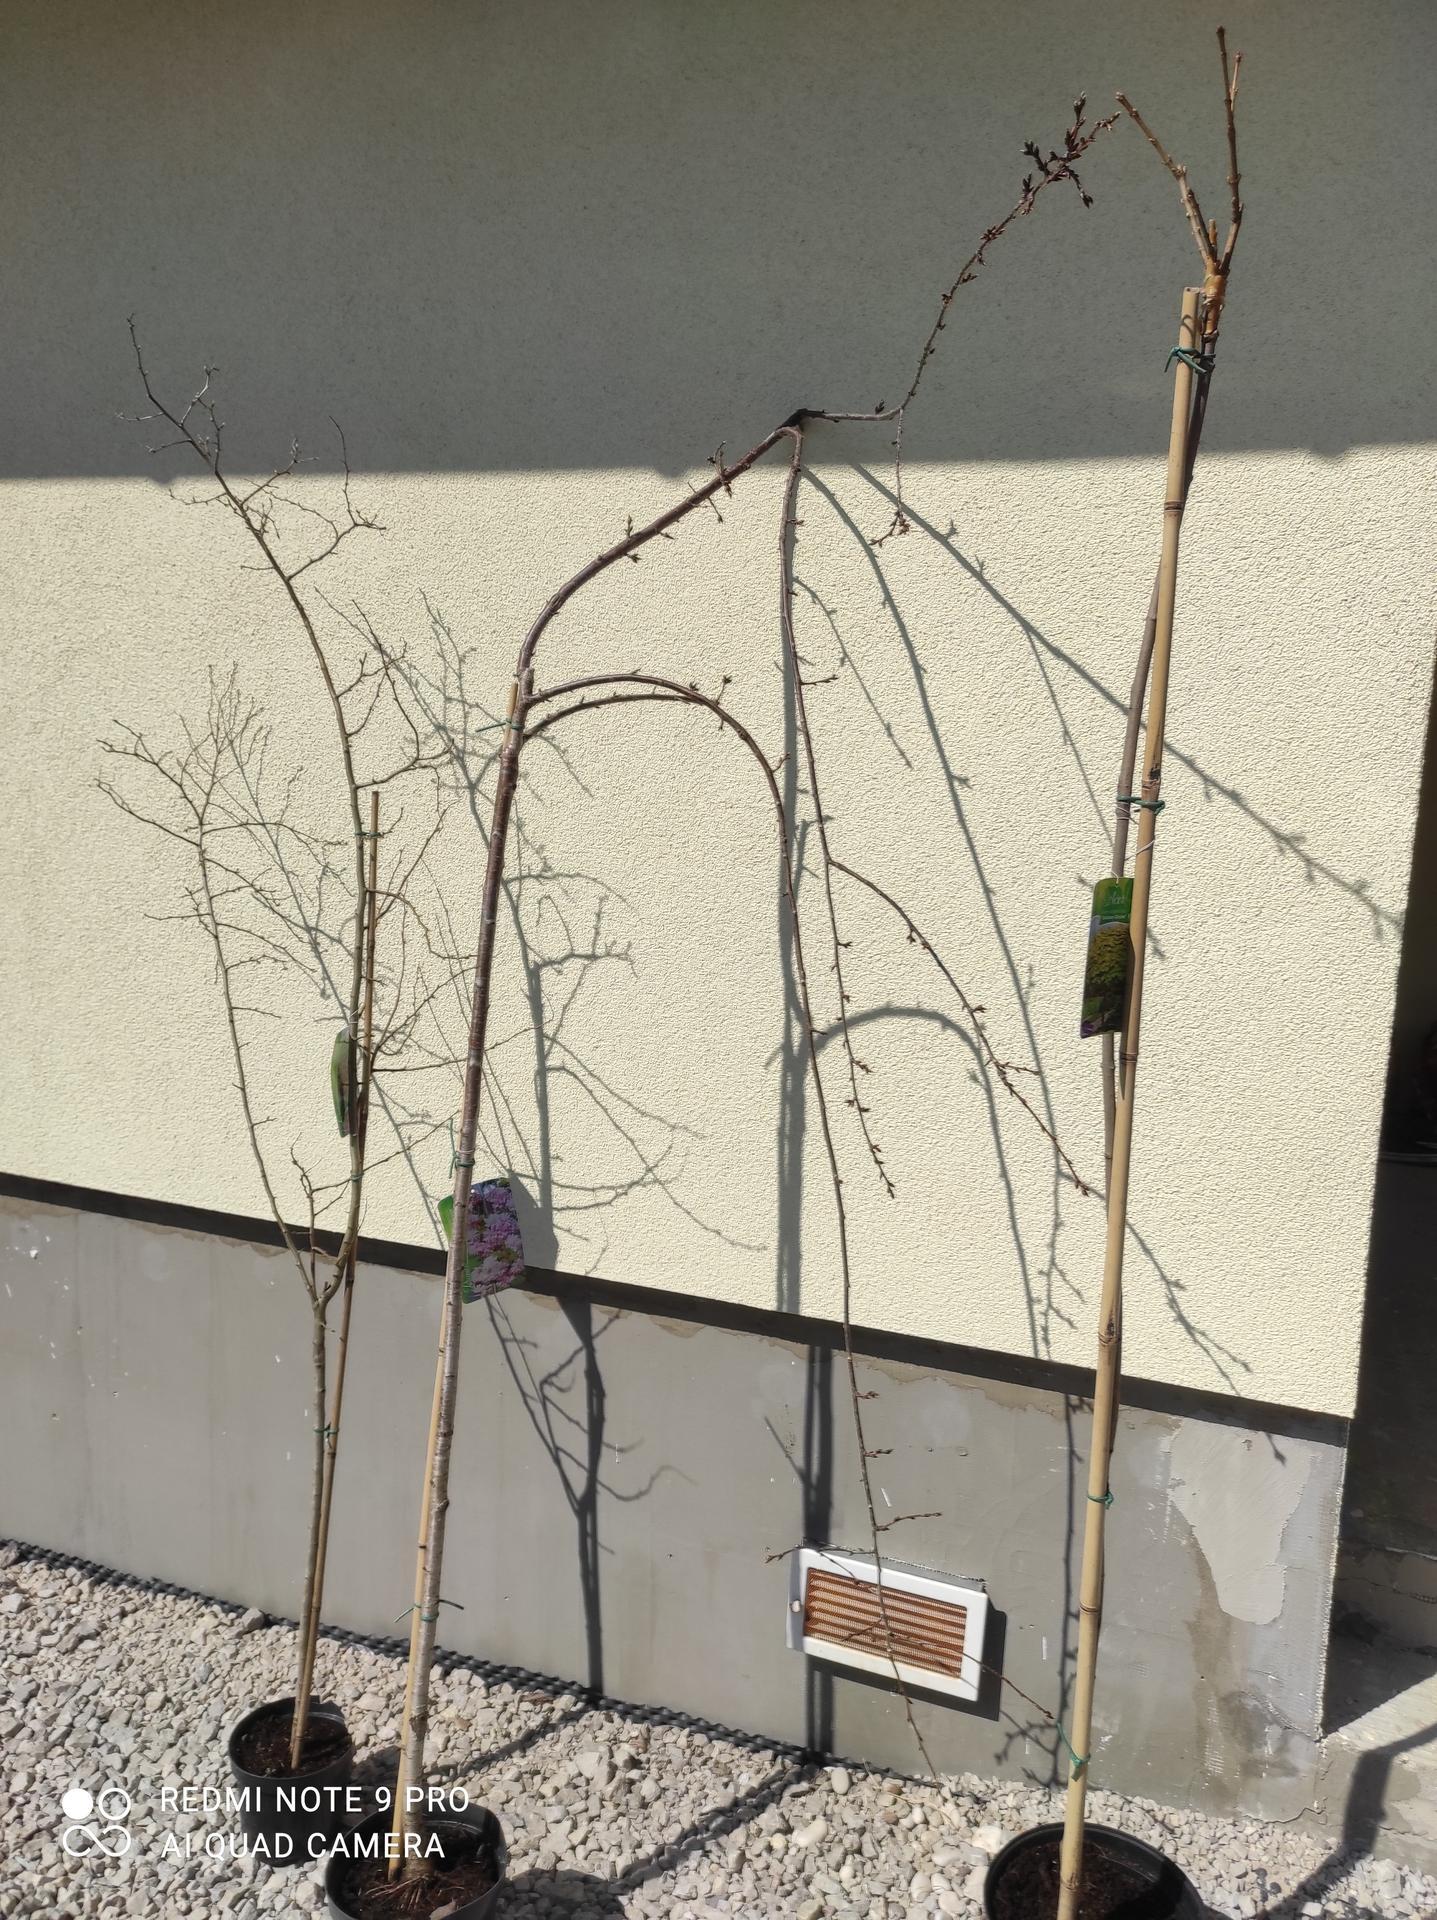 Vidiečan - pokračujeme vonku. - Prišli nejaké stromy: hloh, čerešňa, javor.